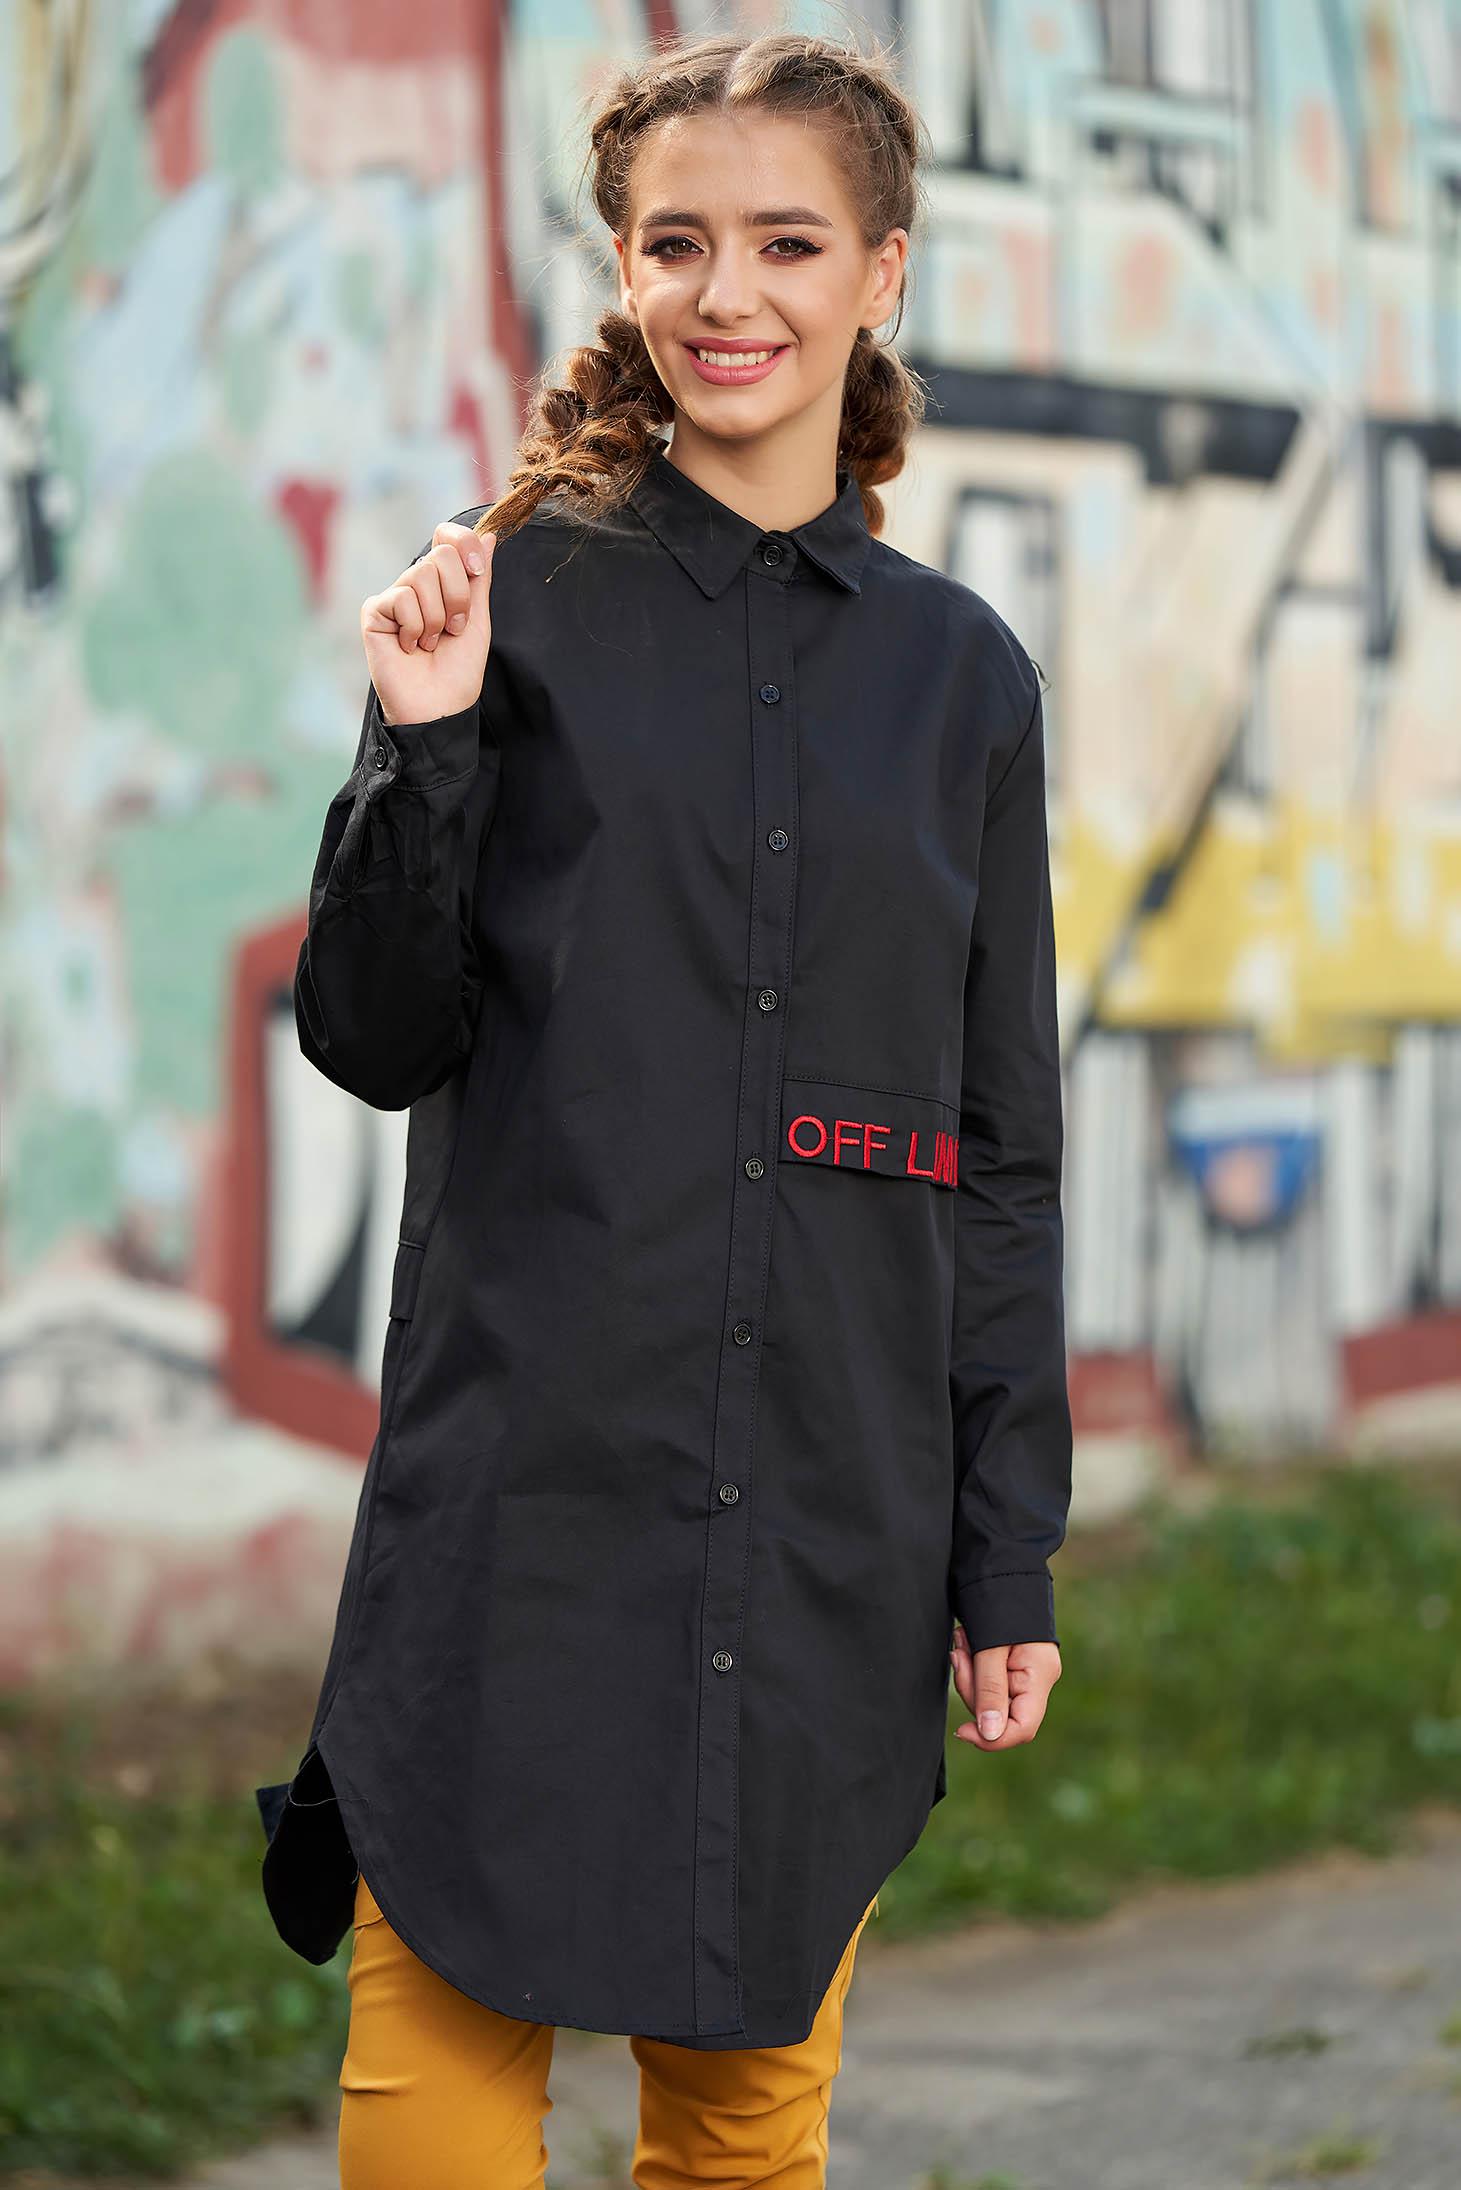 Camasa dama SunShine neagra casual asimetrica din bumbac cu croi larg cu maneci lungi si imprimeu cu scris